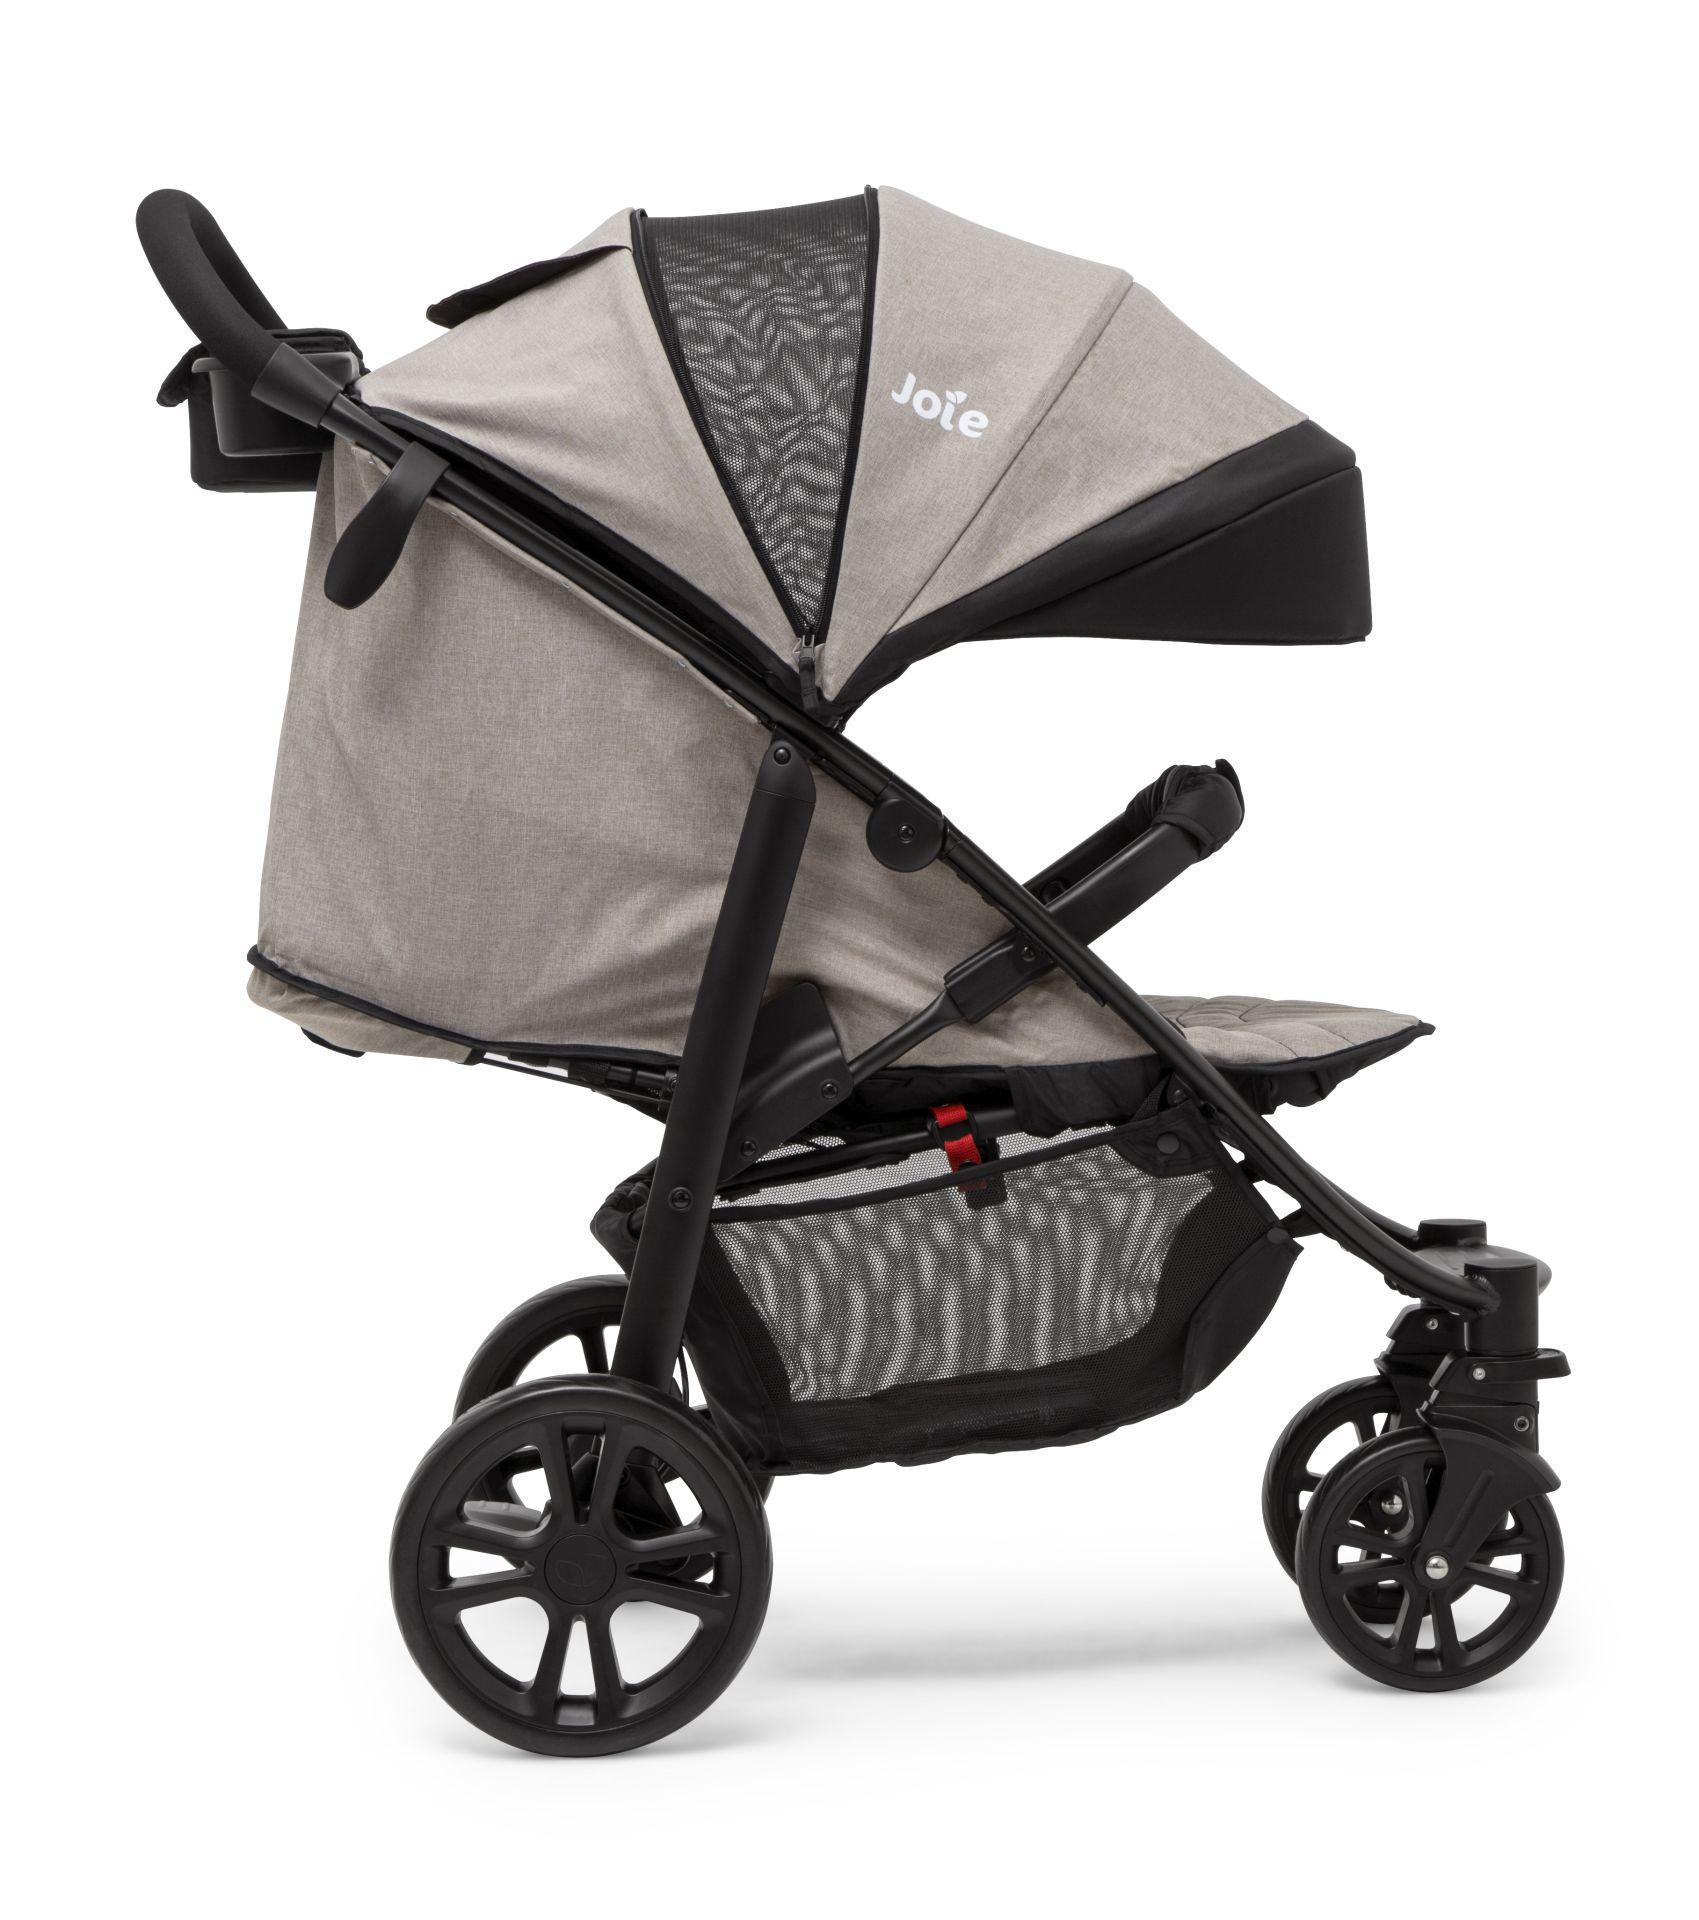 joie buggy litetrax 4 2017 khaki buy at kidsroom strollers. Black Bedroom Furniture Sets. Home Design Ideas